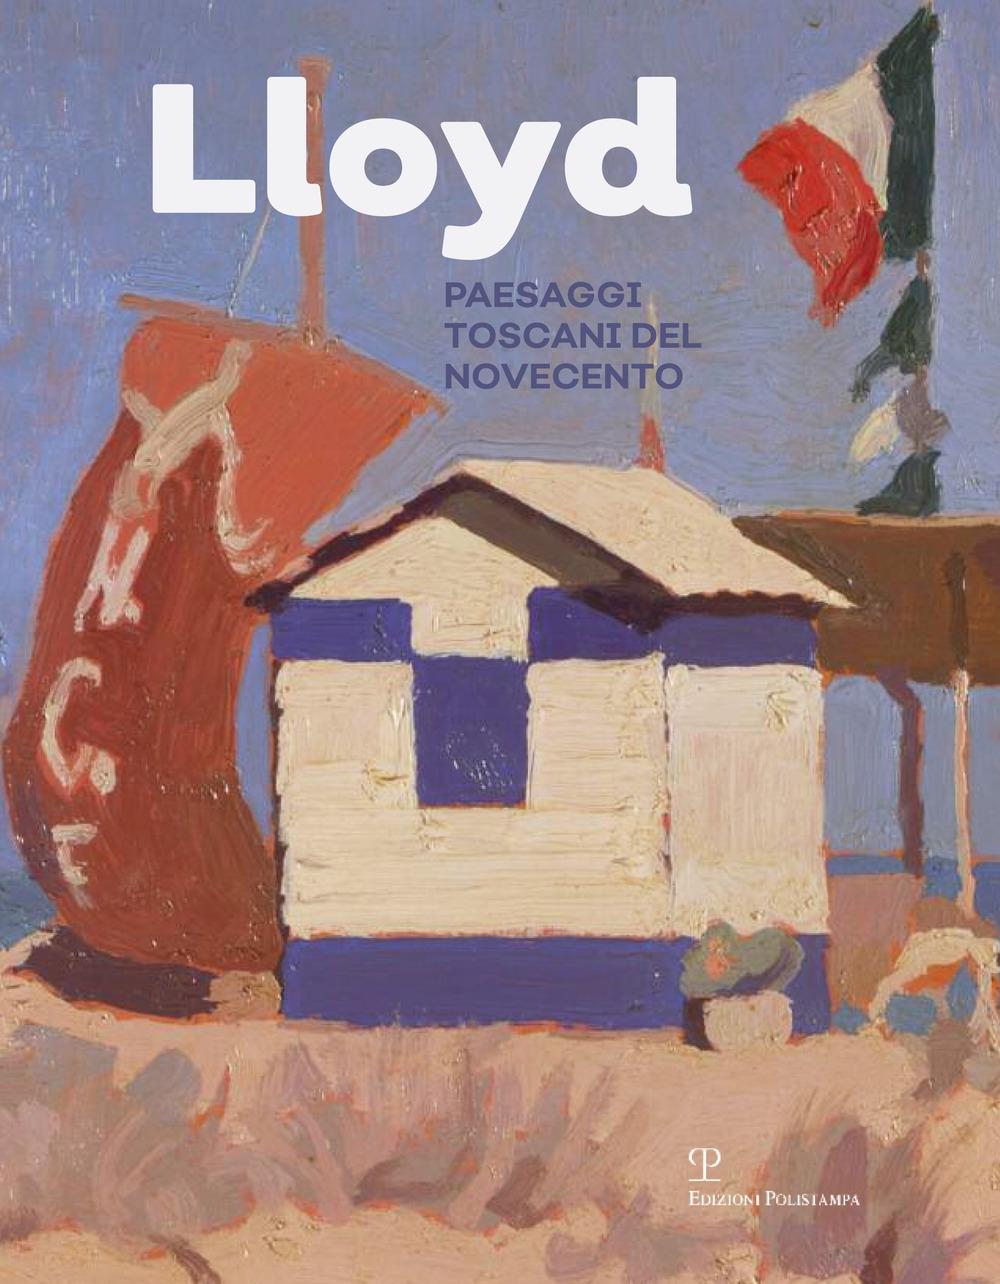 Lloyd. Paesaggi toscani del Novecento